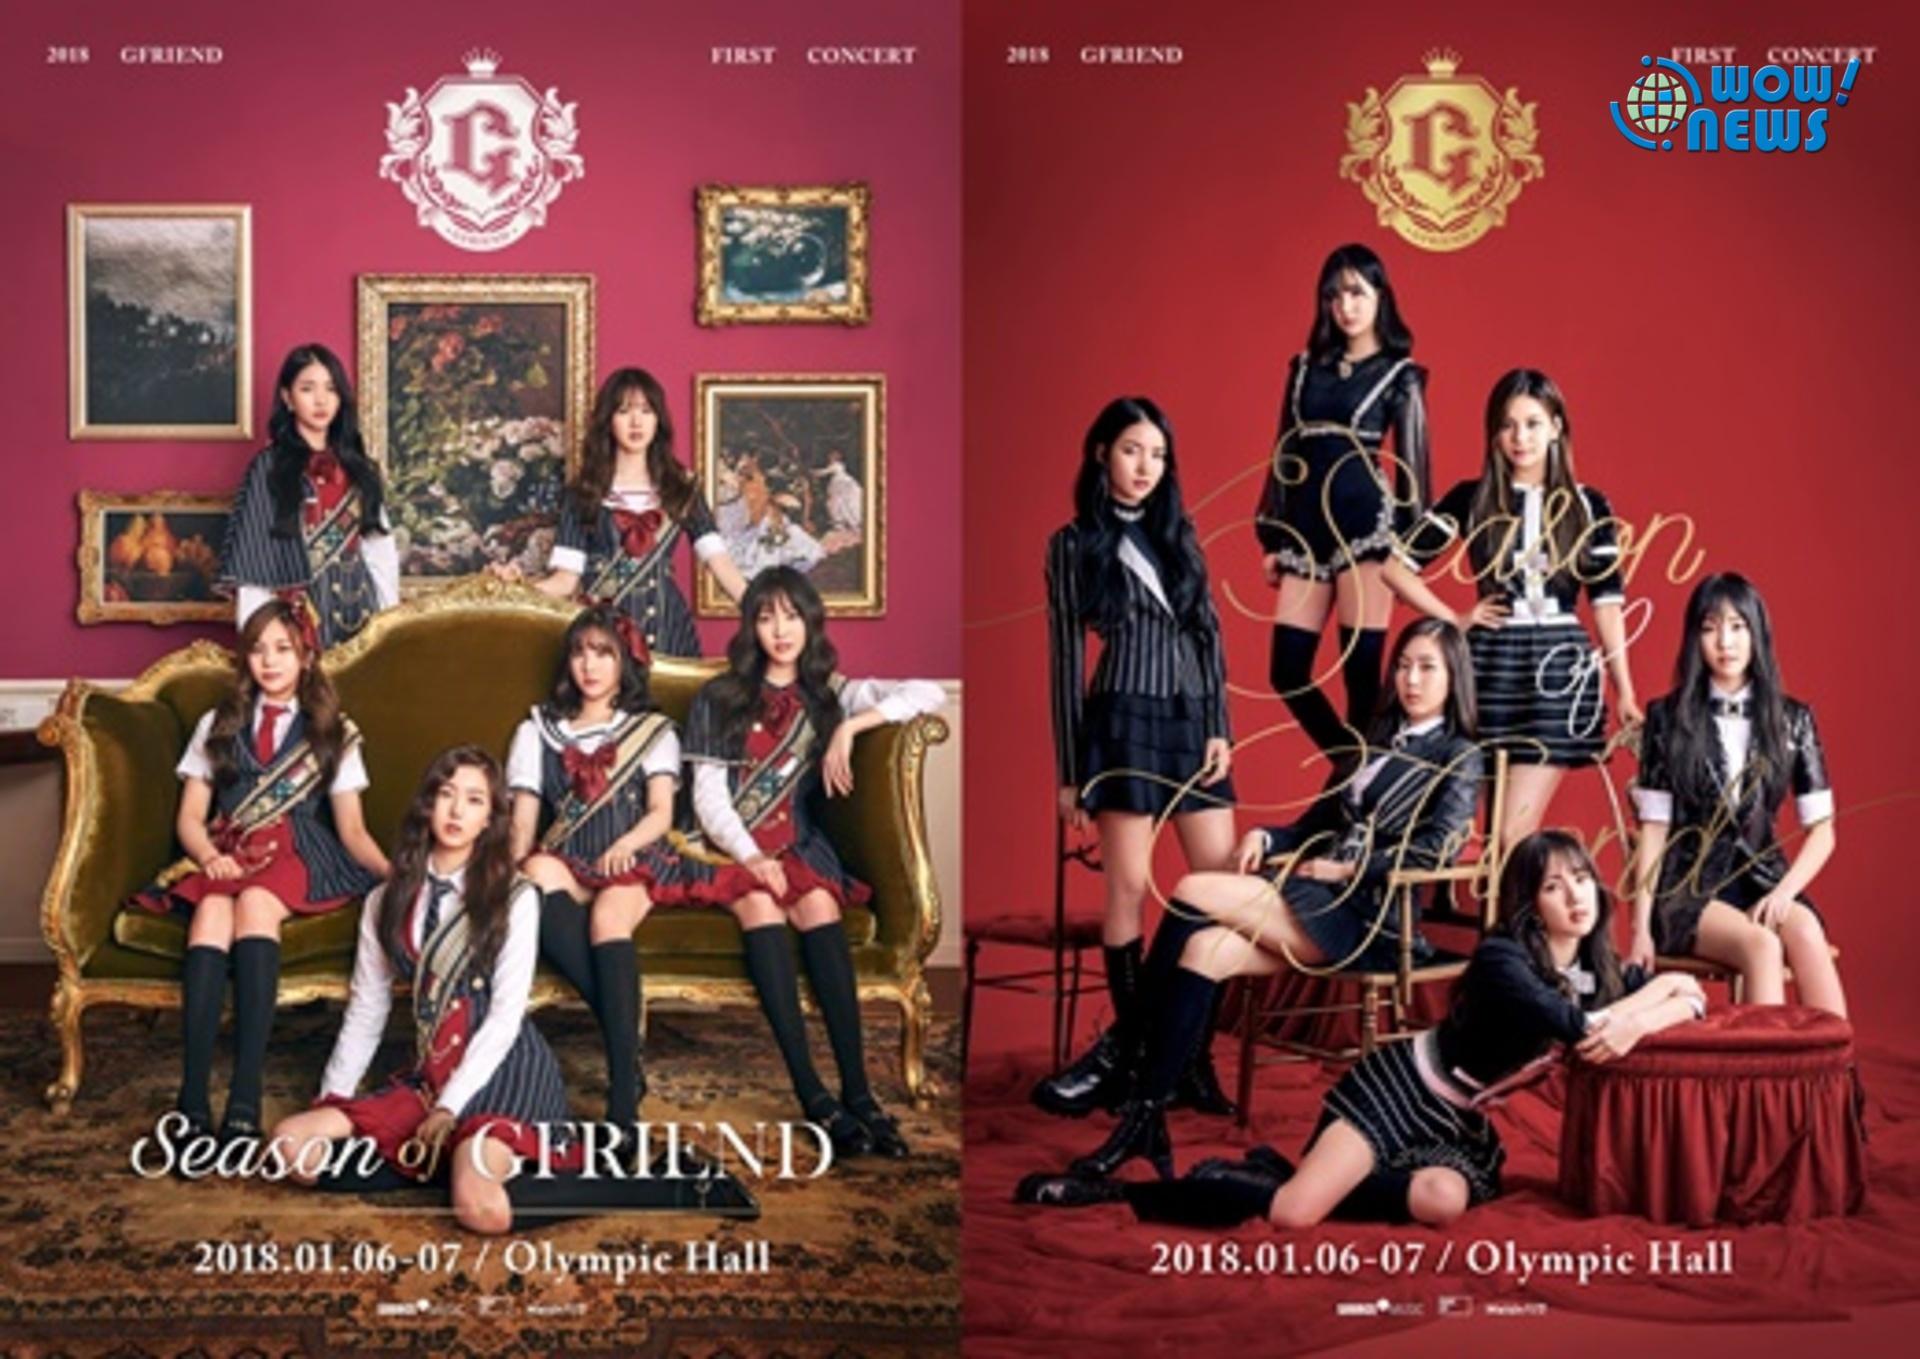 gfriend演唱会海报公开 多彩舞台令人期待